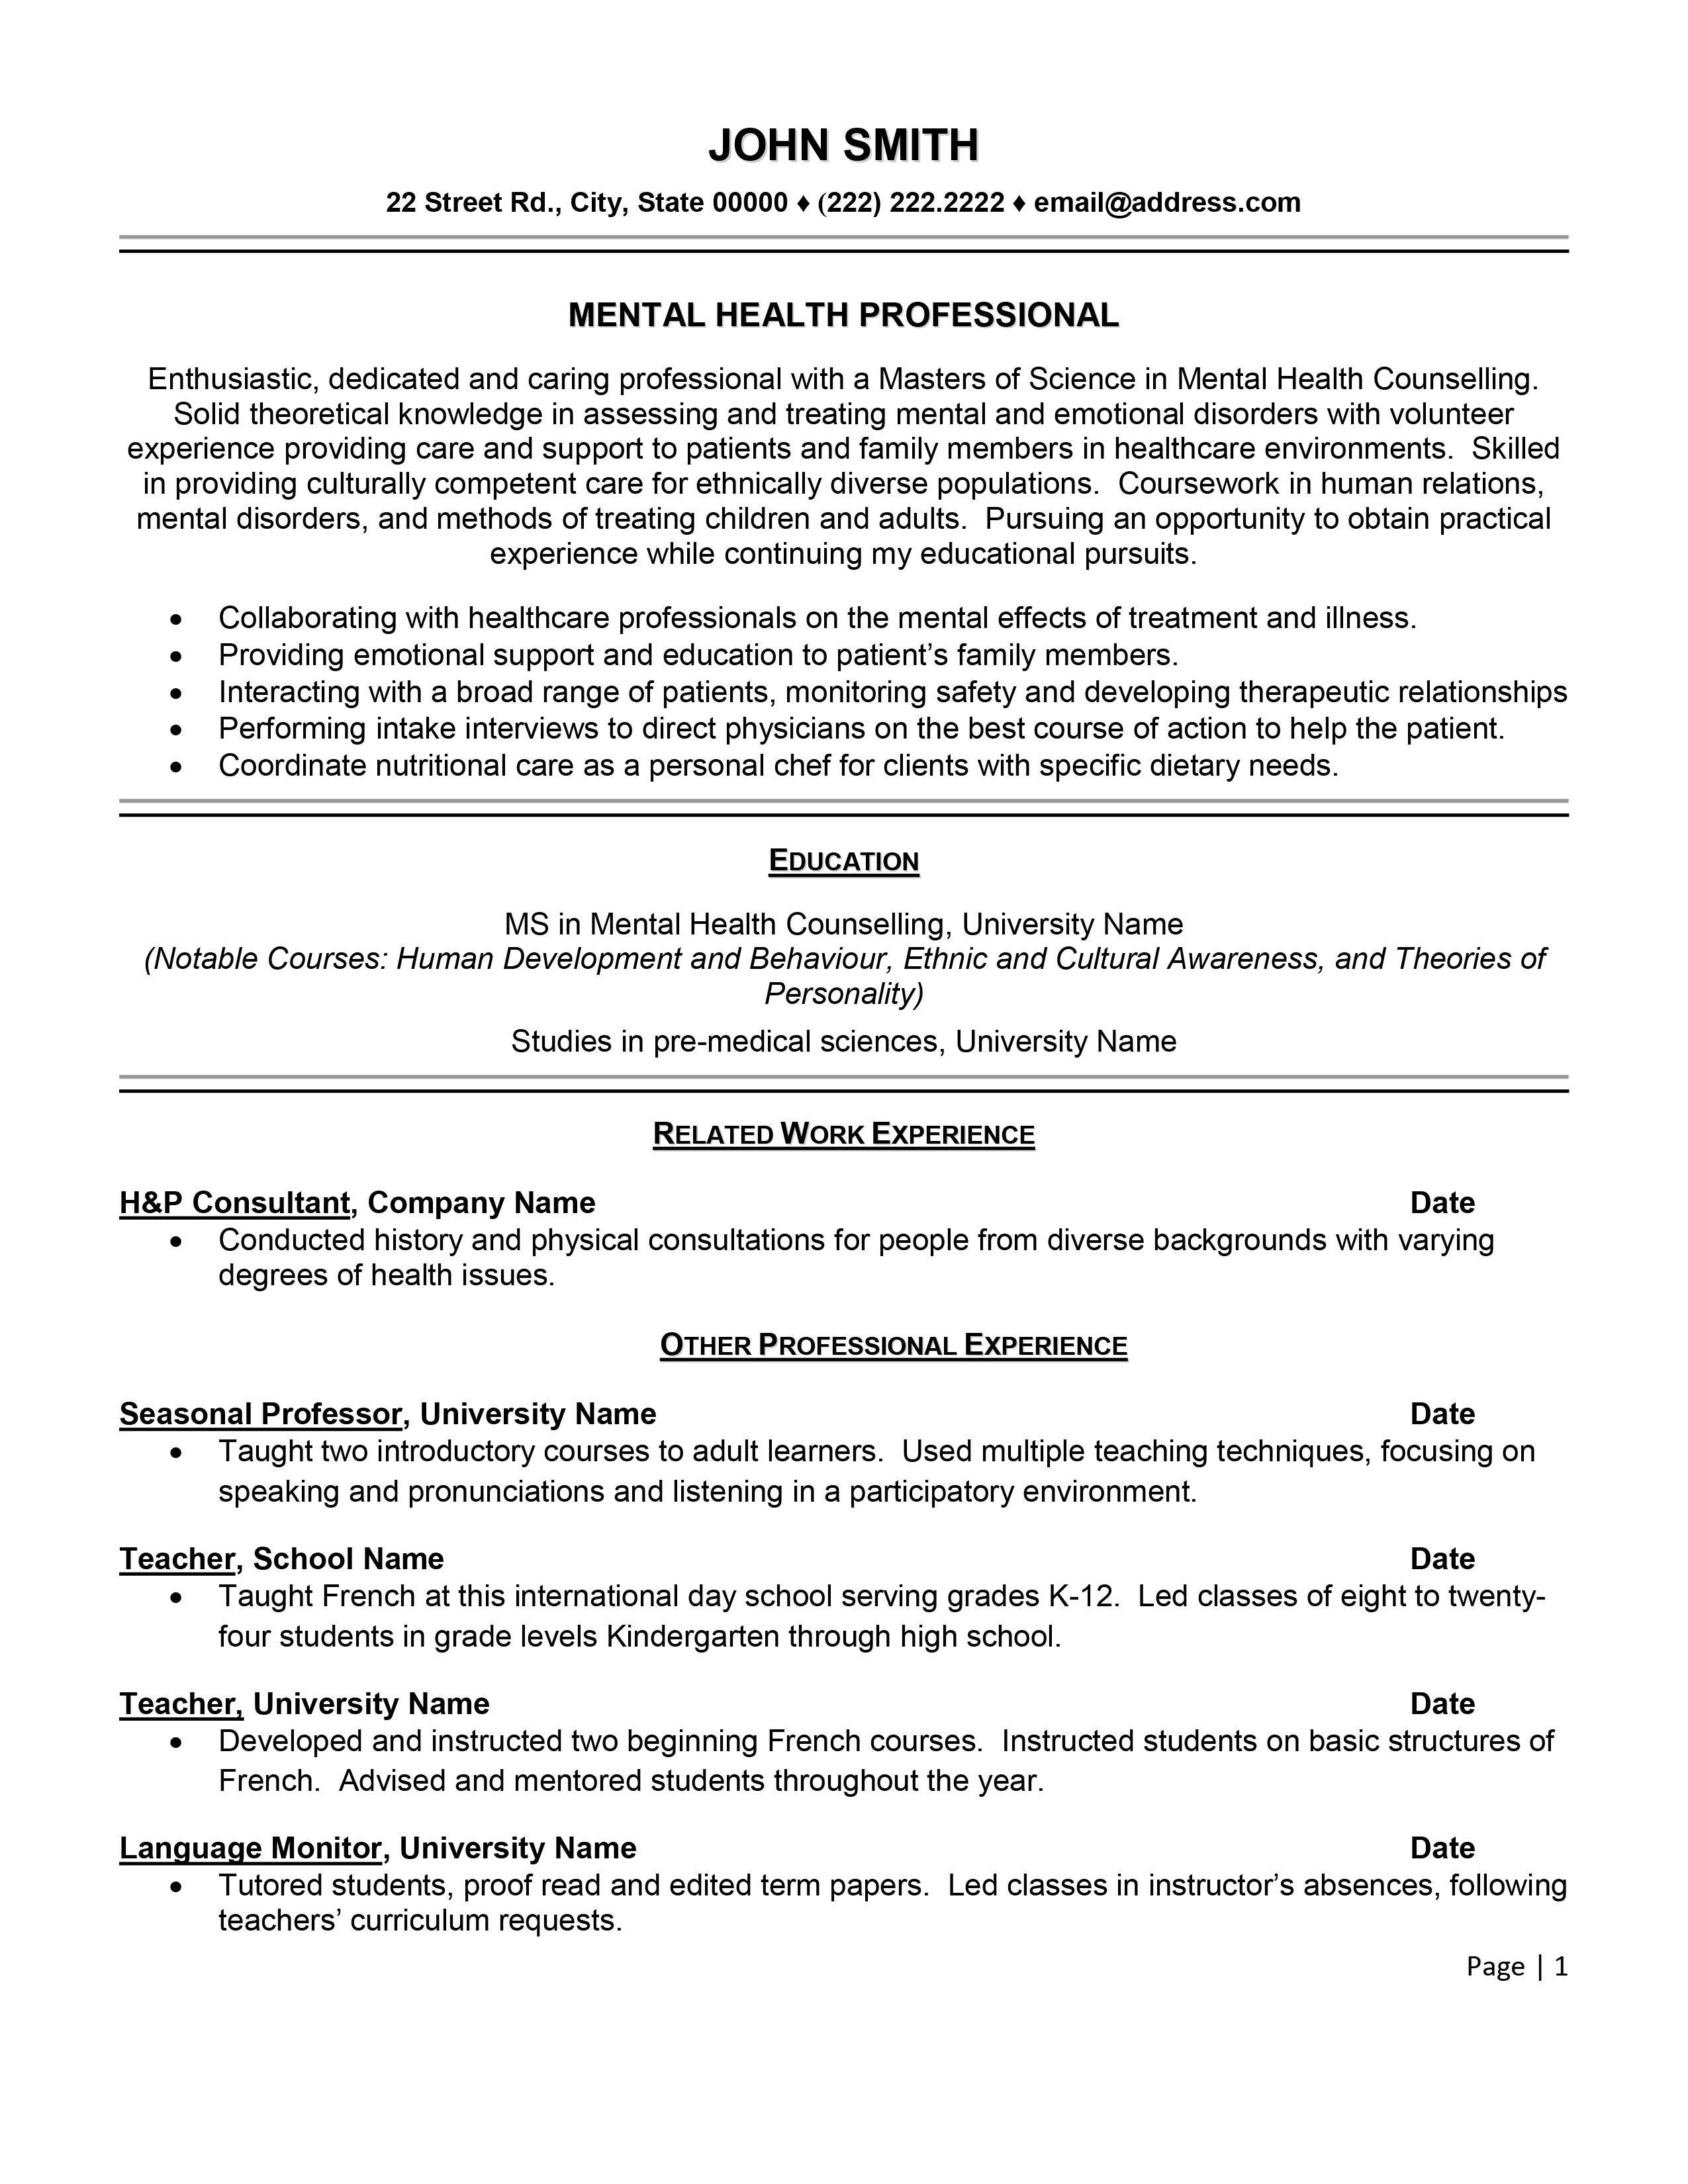 Senior Educational Administrator Resume Template Premium Resume Samples Example Resume Templates Education Resume Instructional Leadership